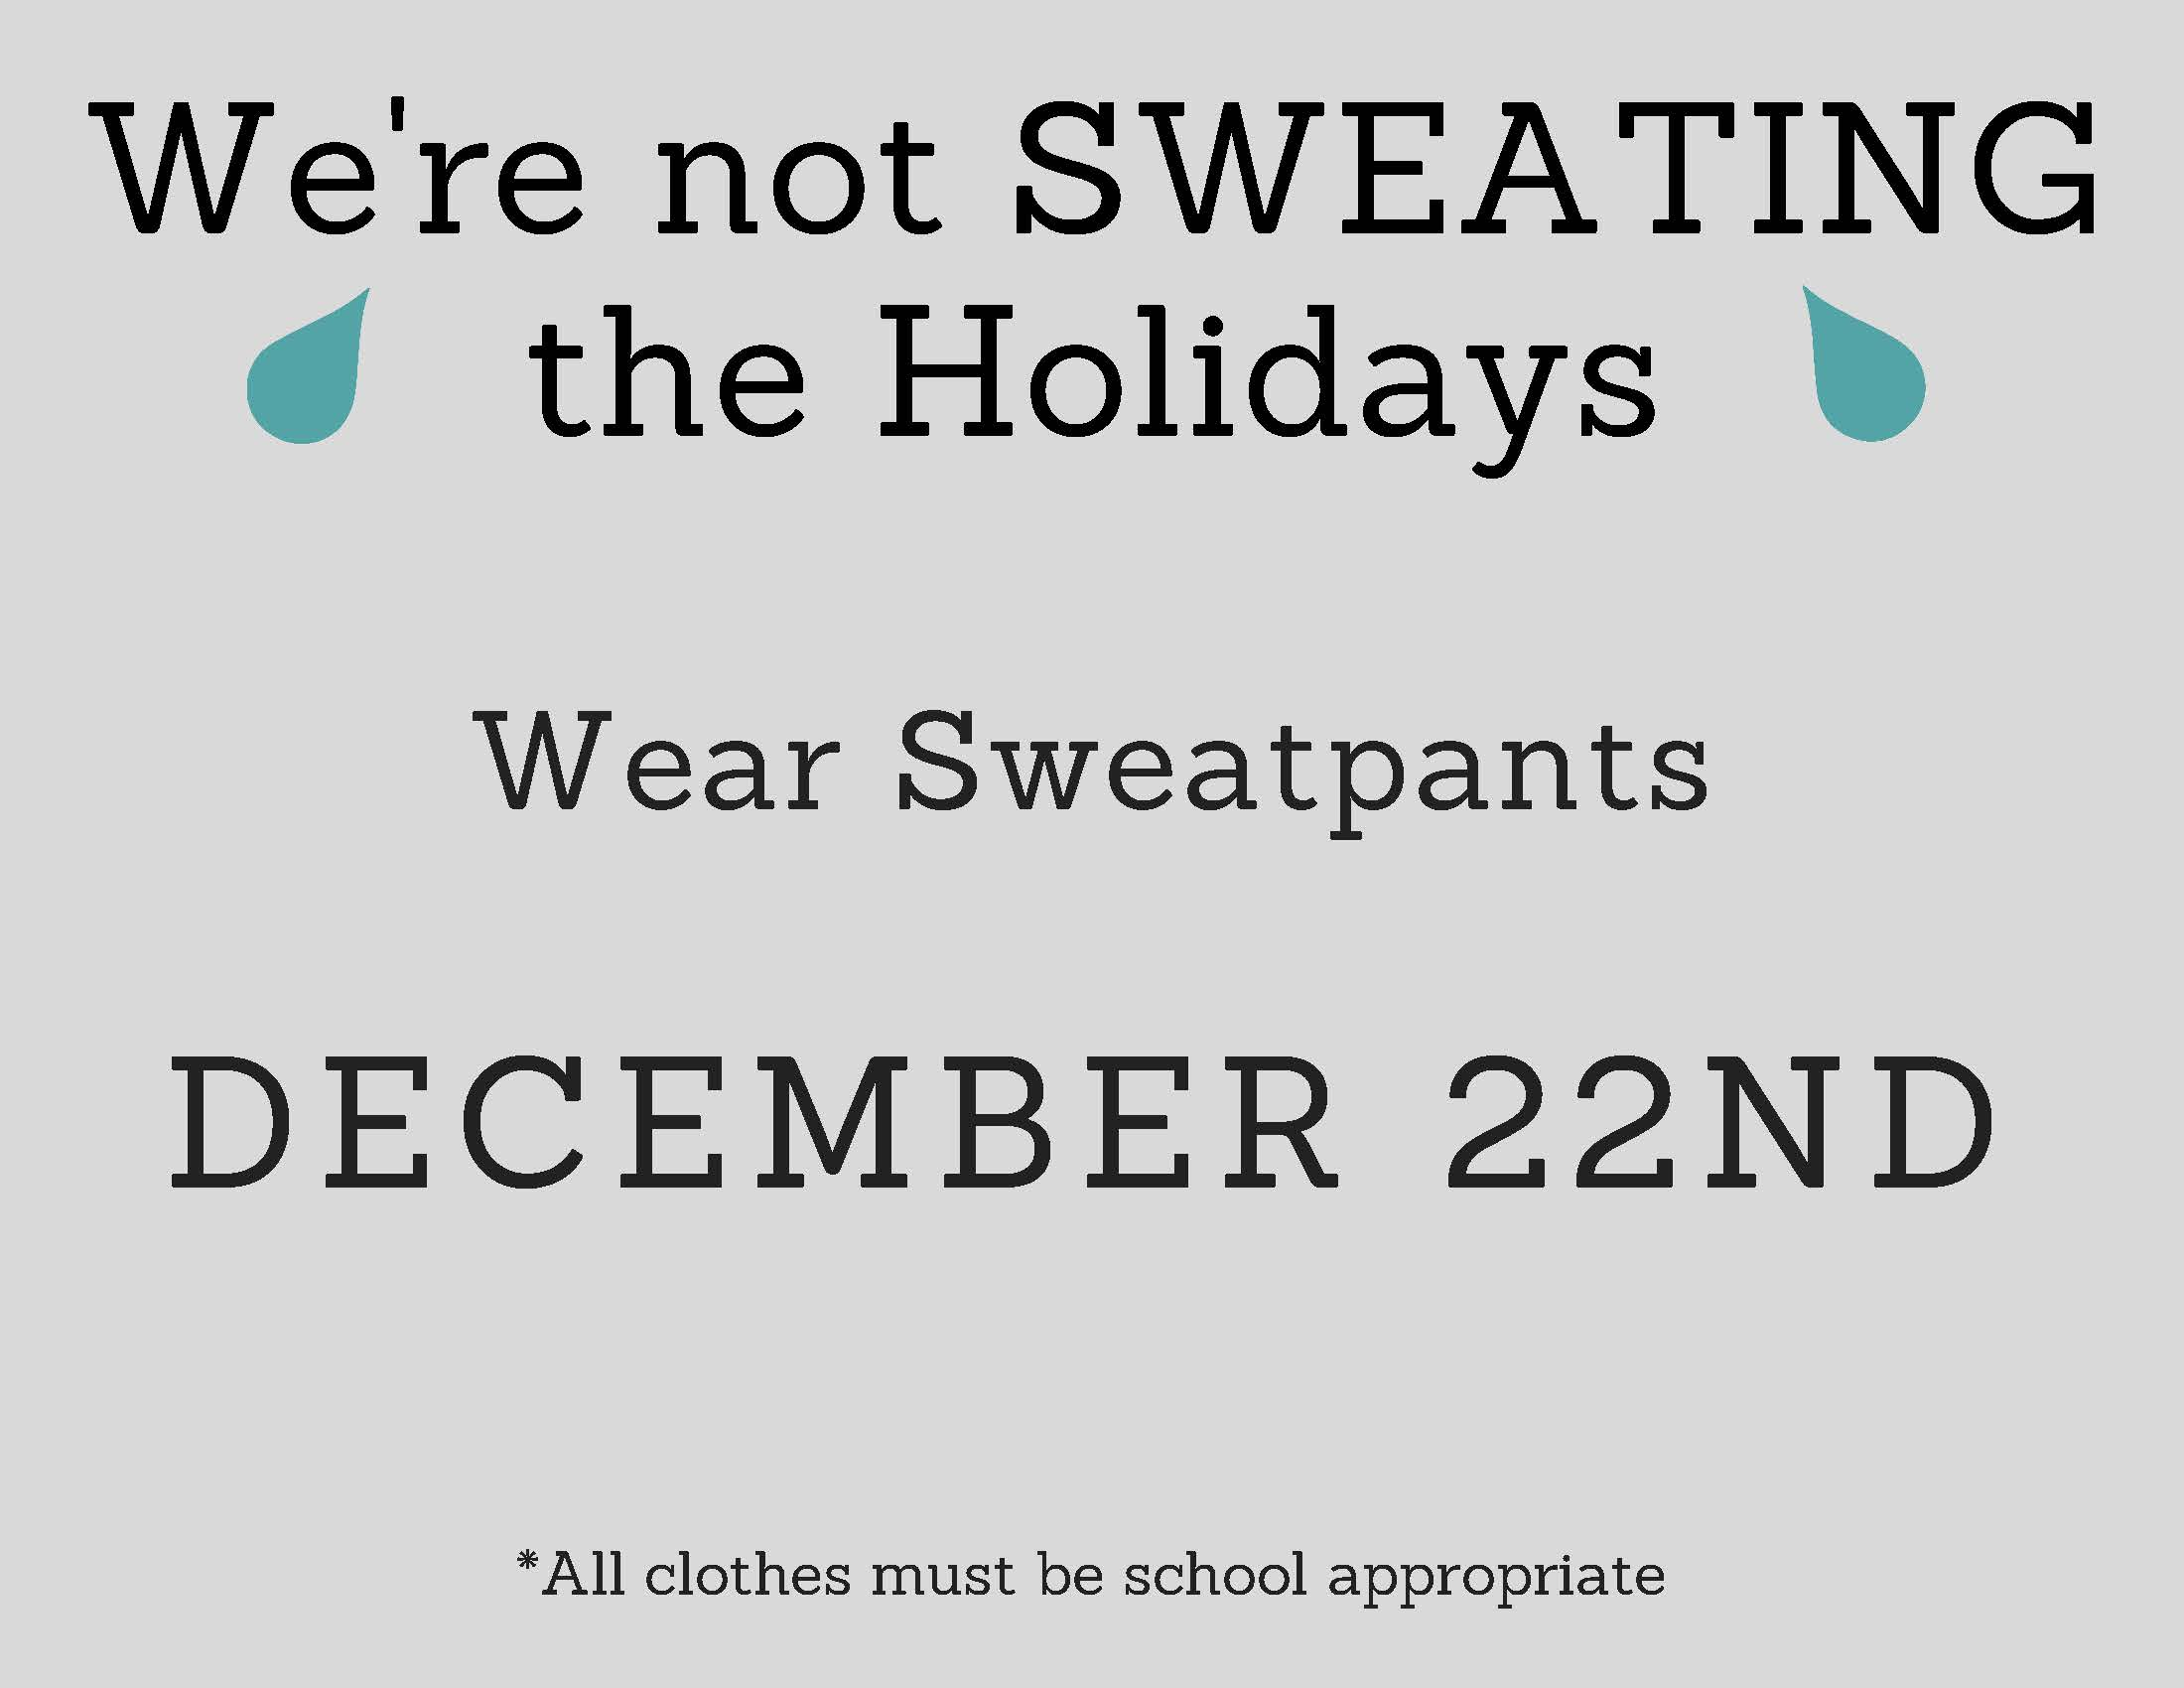 sweat-the-holidays.jpg